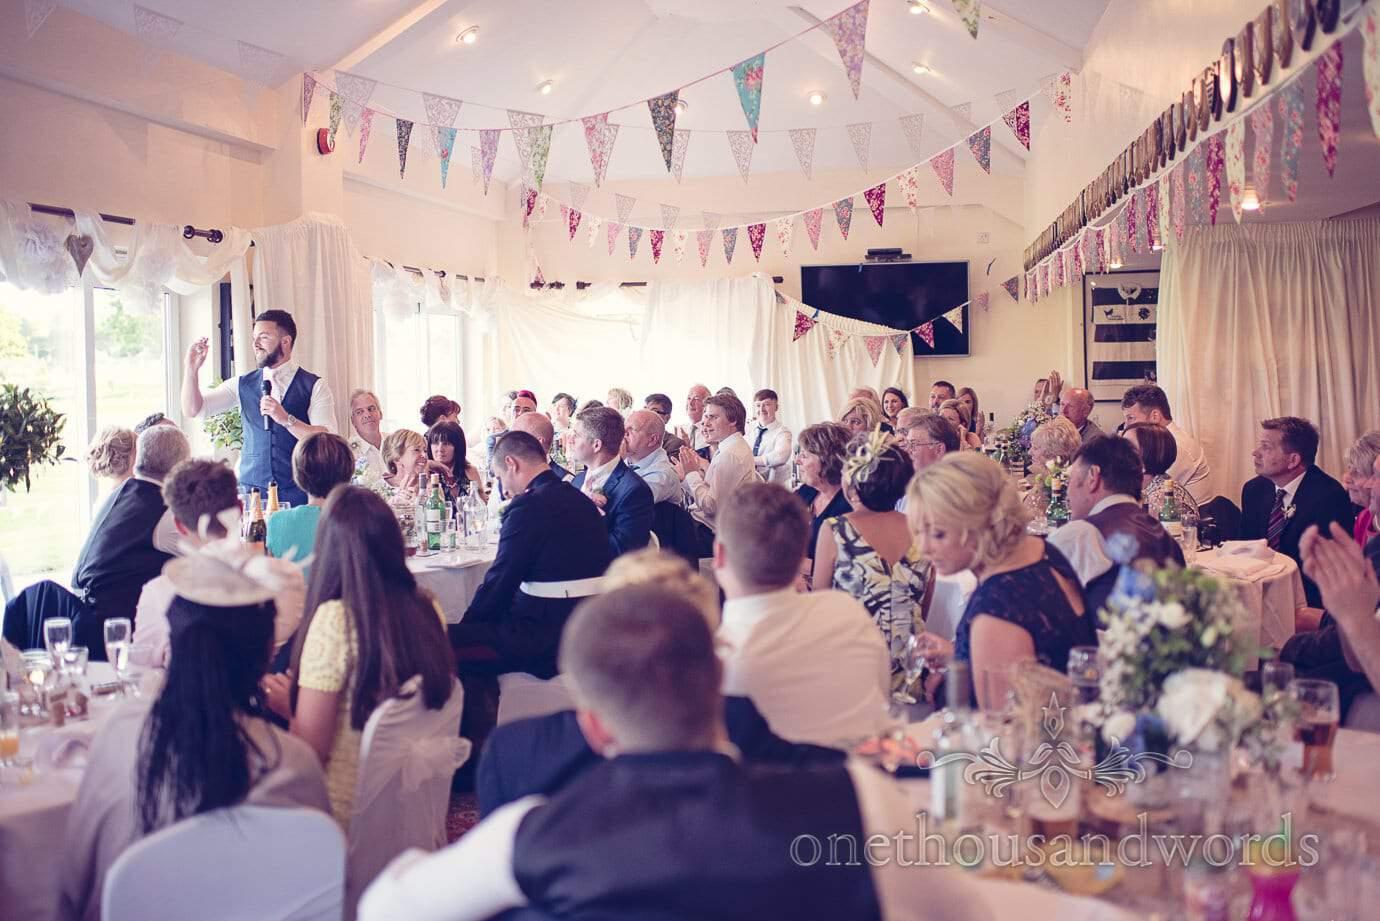 Wedding speeches at Wareham Rugby Club in Dorset